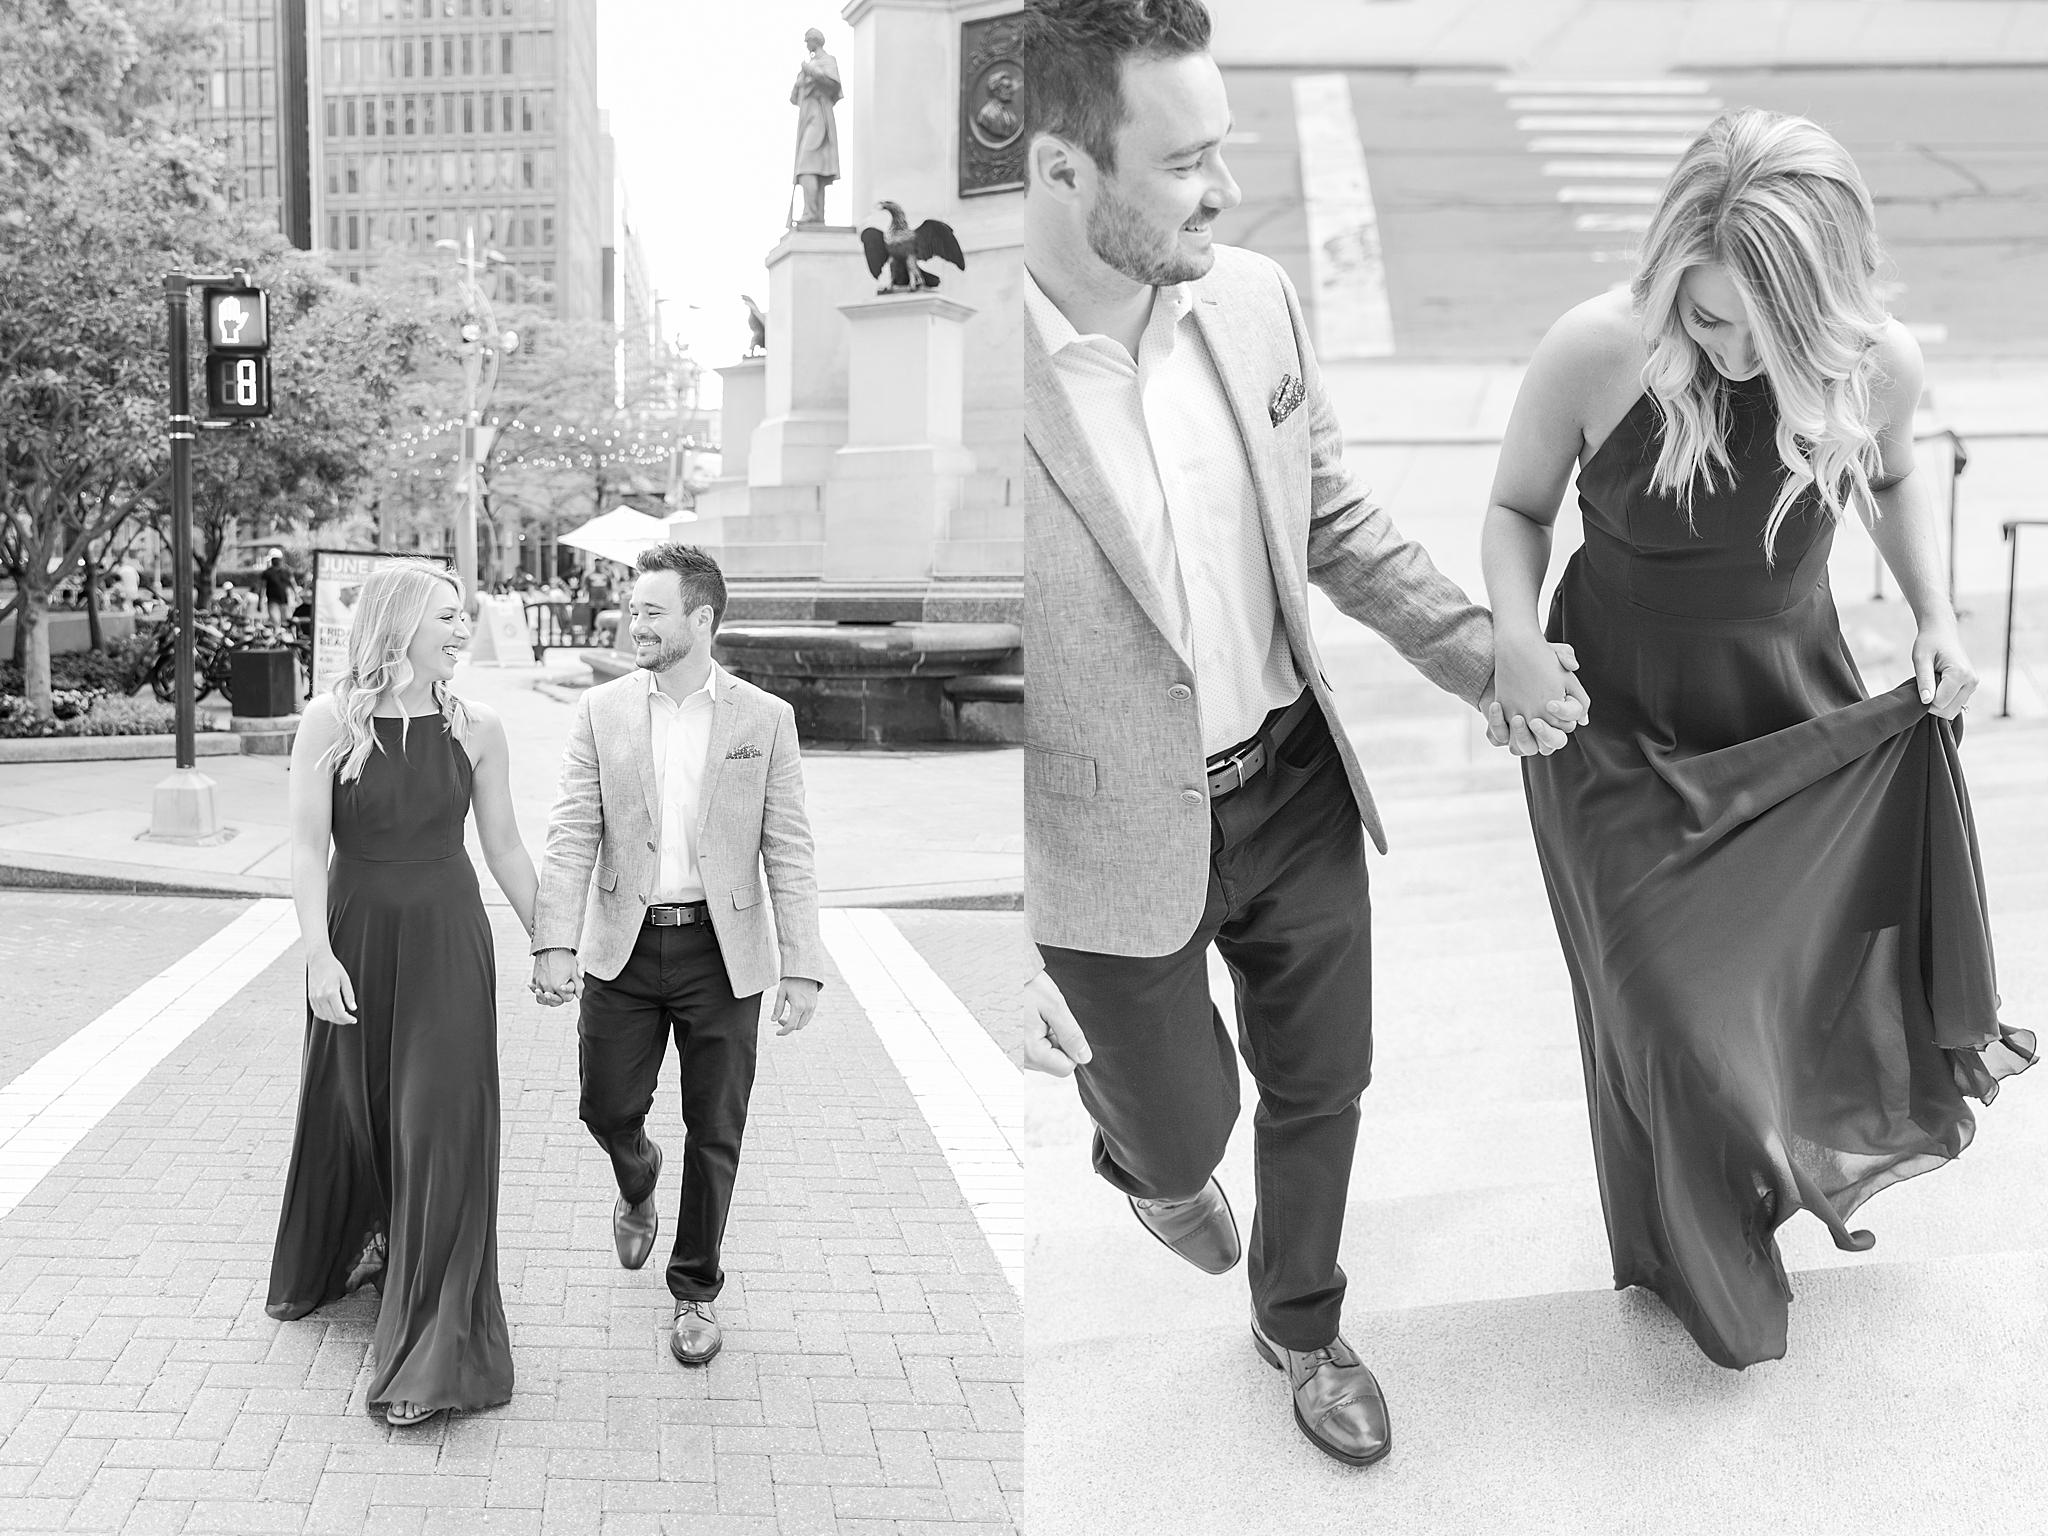 detroit-wedding-photographer-downtown-detroit-belle-isle-engagement-photos-sarah-eric-by-courtney-carolyn-photography_0025.jpg